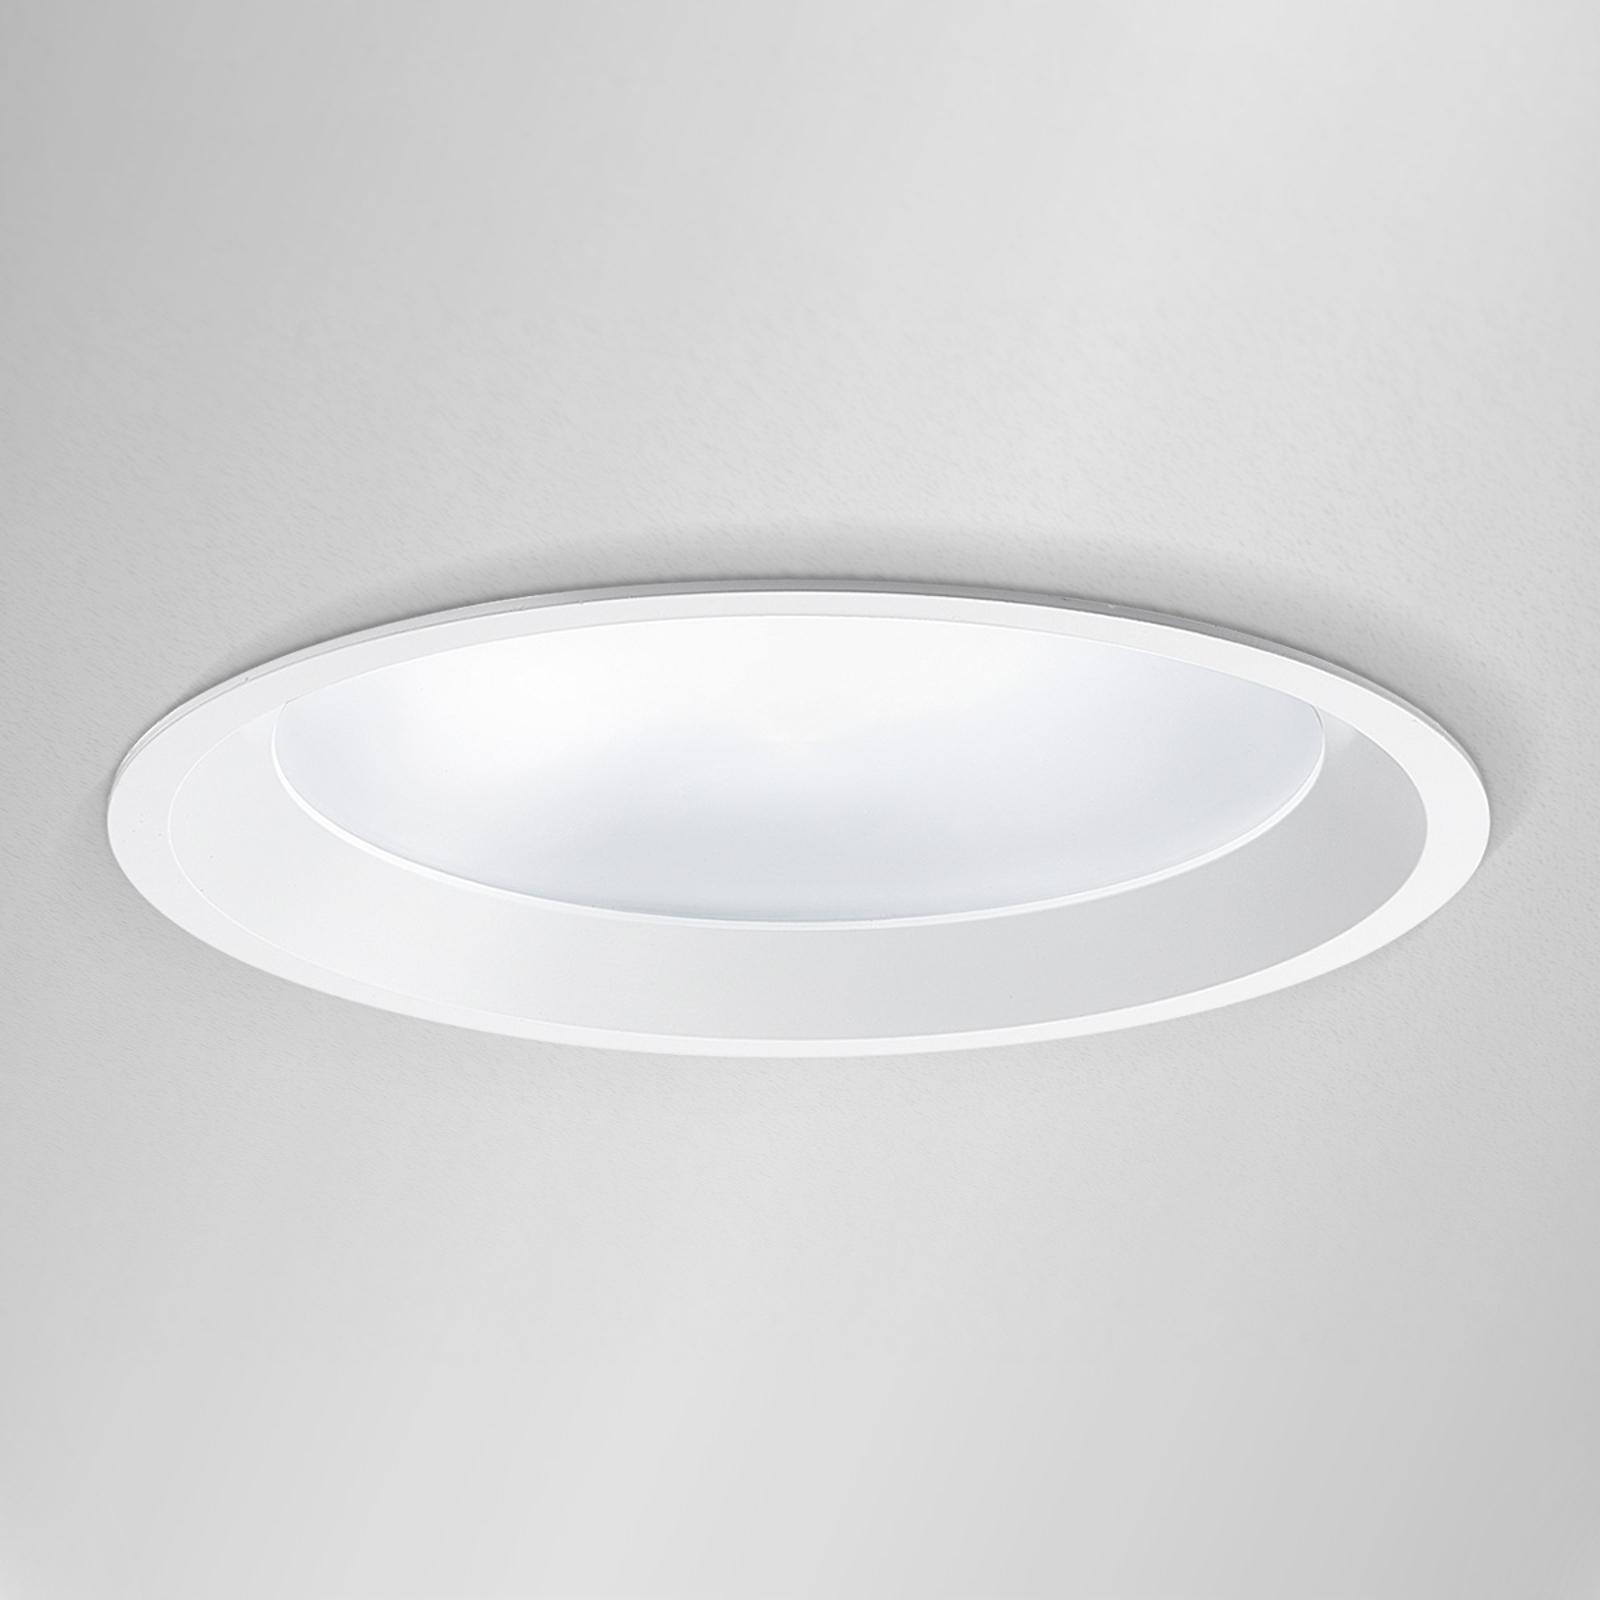 Priemer 19cm – zapustené LED downlight Strato 190_3023095_1